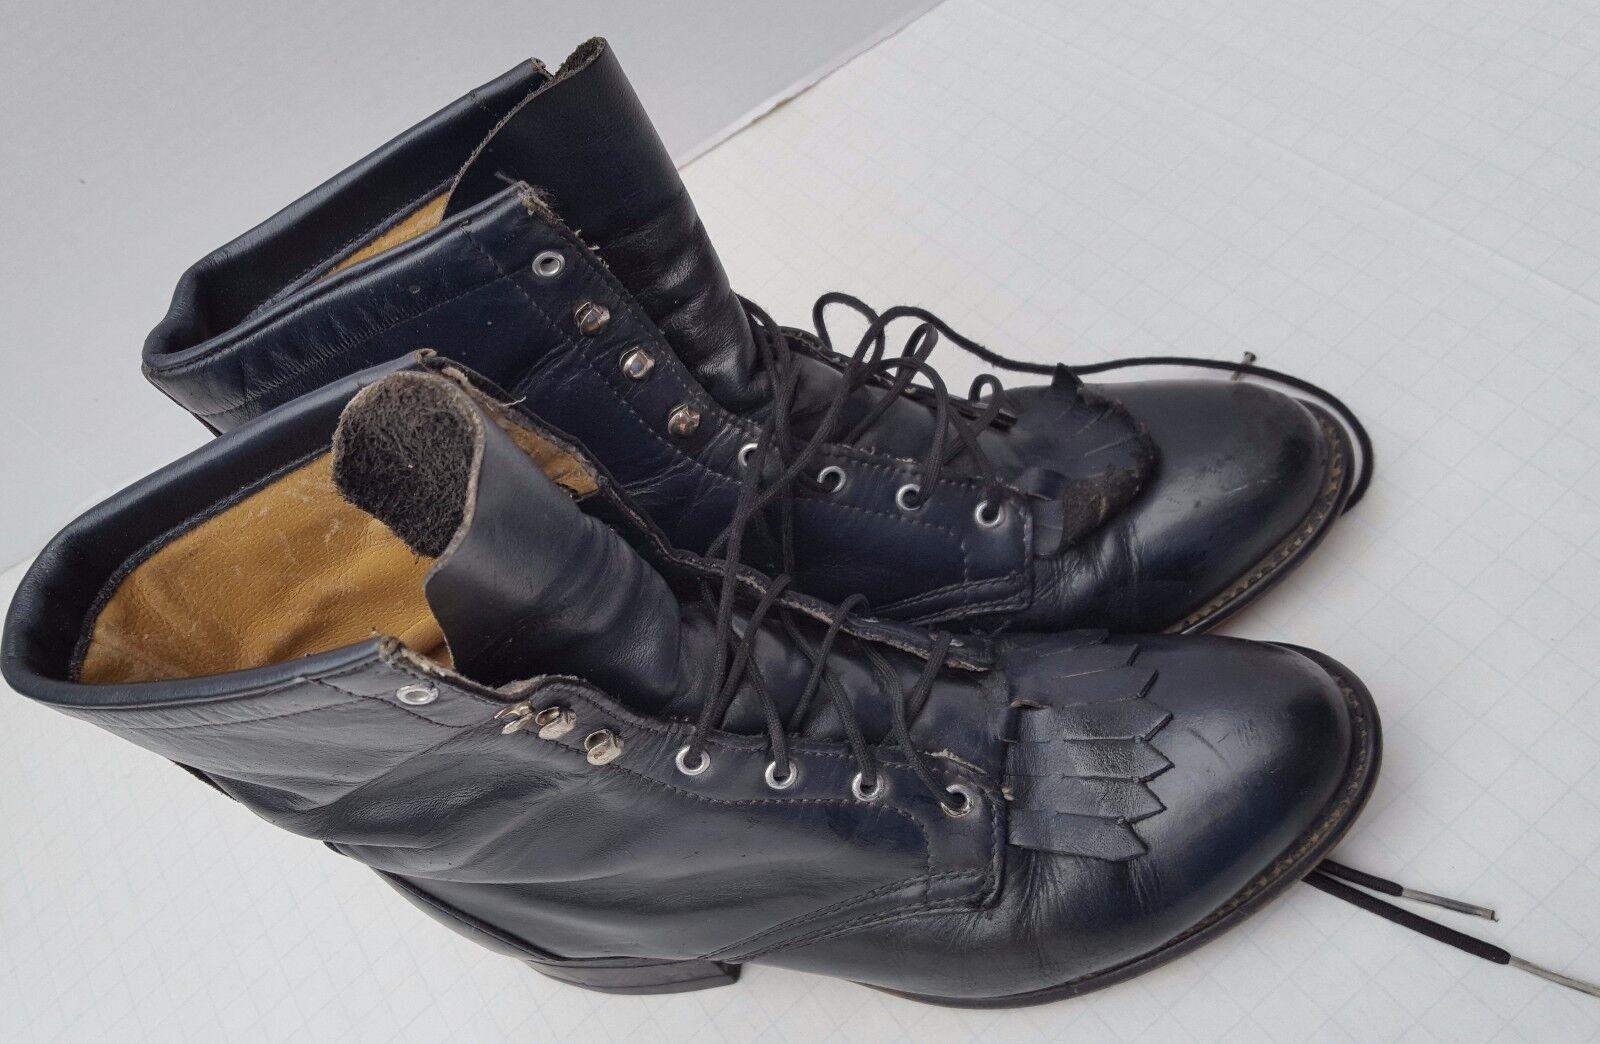 Laredo Black Leather Granny Lace Up Boots Vintage USA Prairie Frontier Kiltie 7